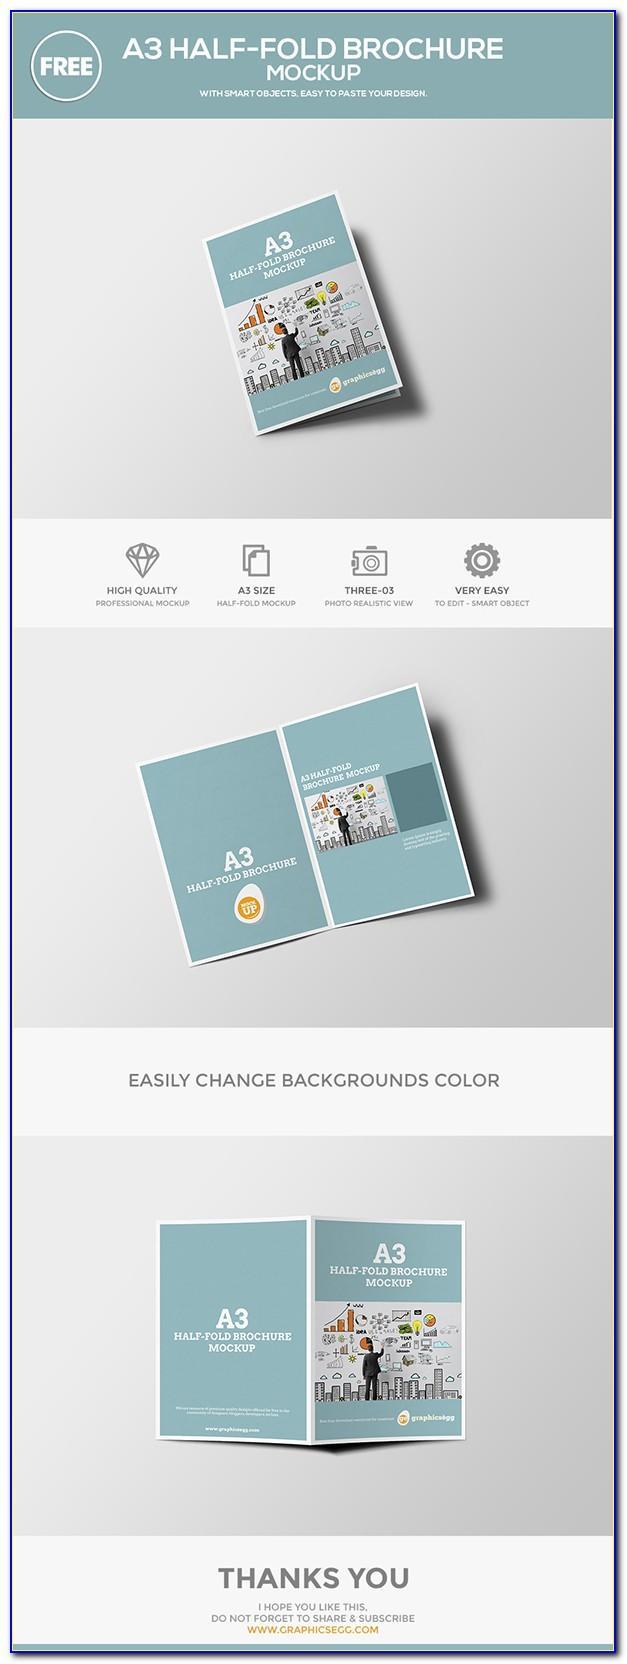 A4 Half Fold Brochure Mockup